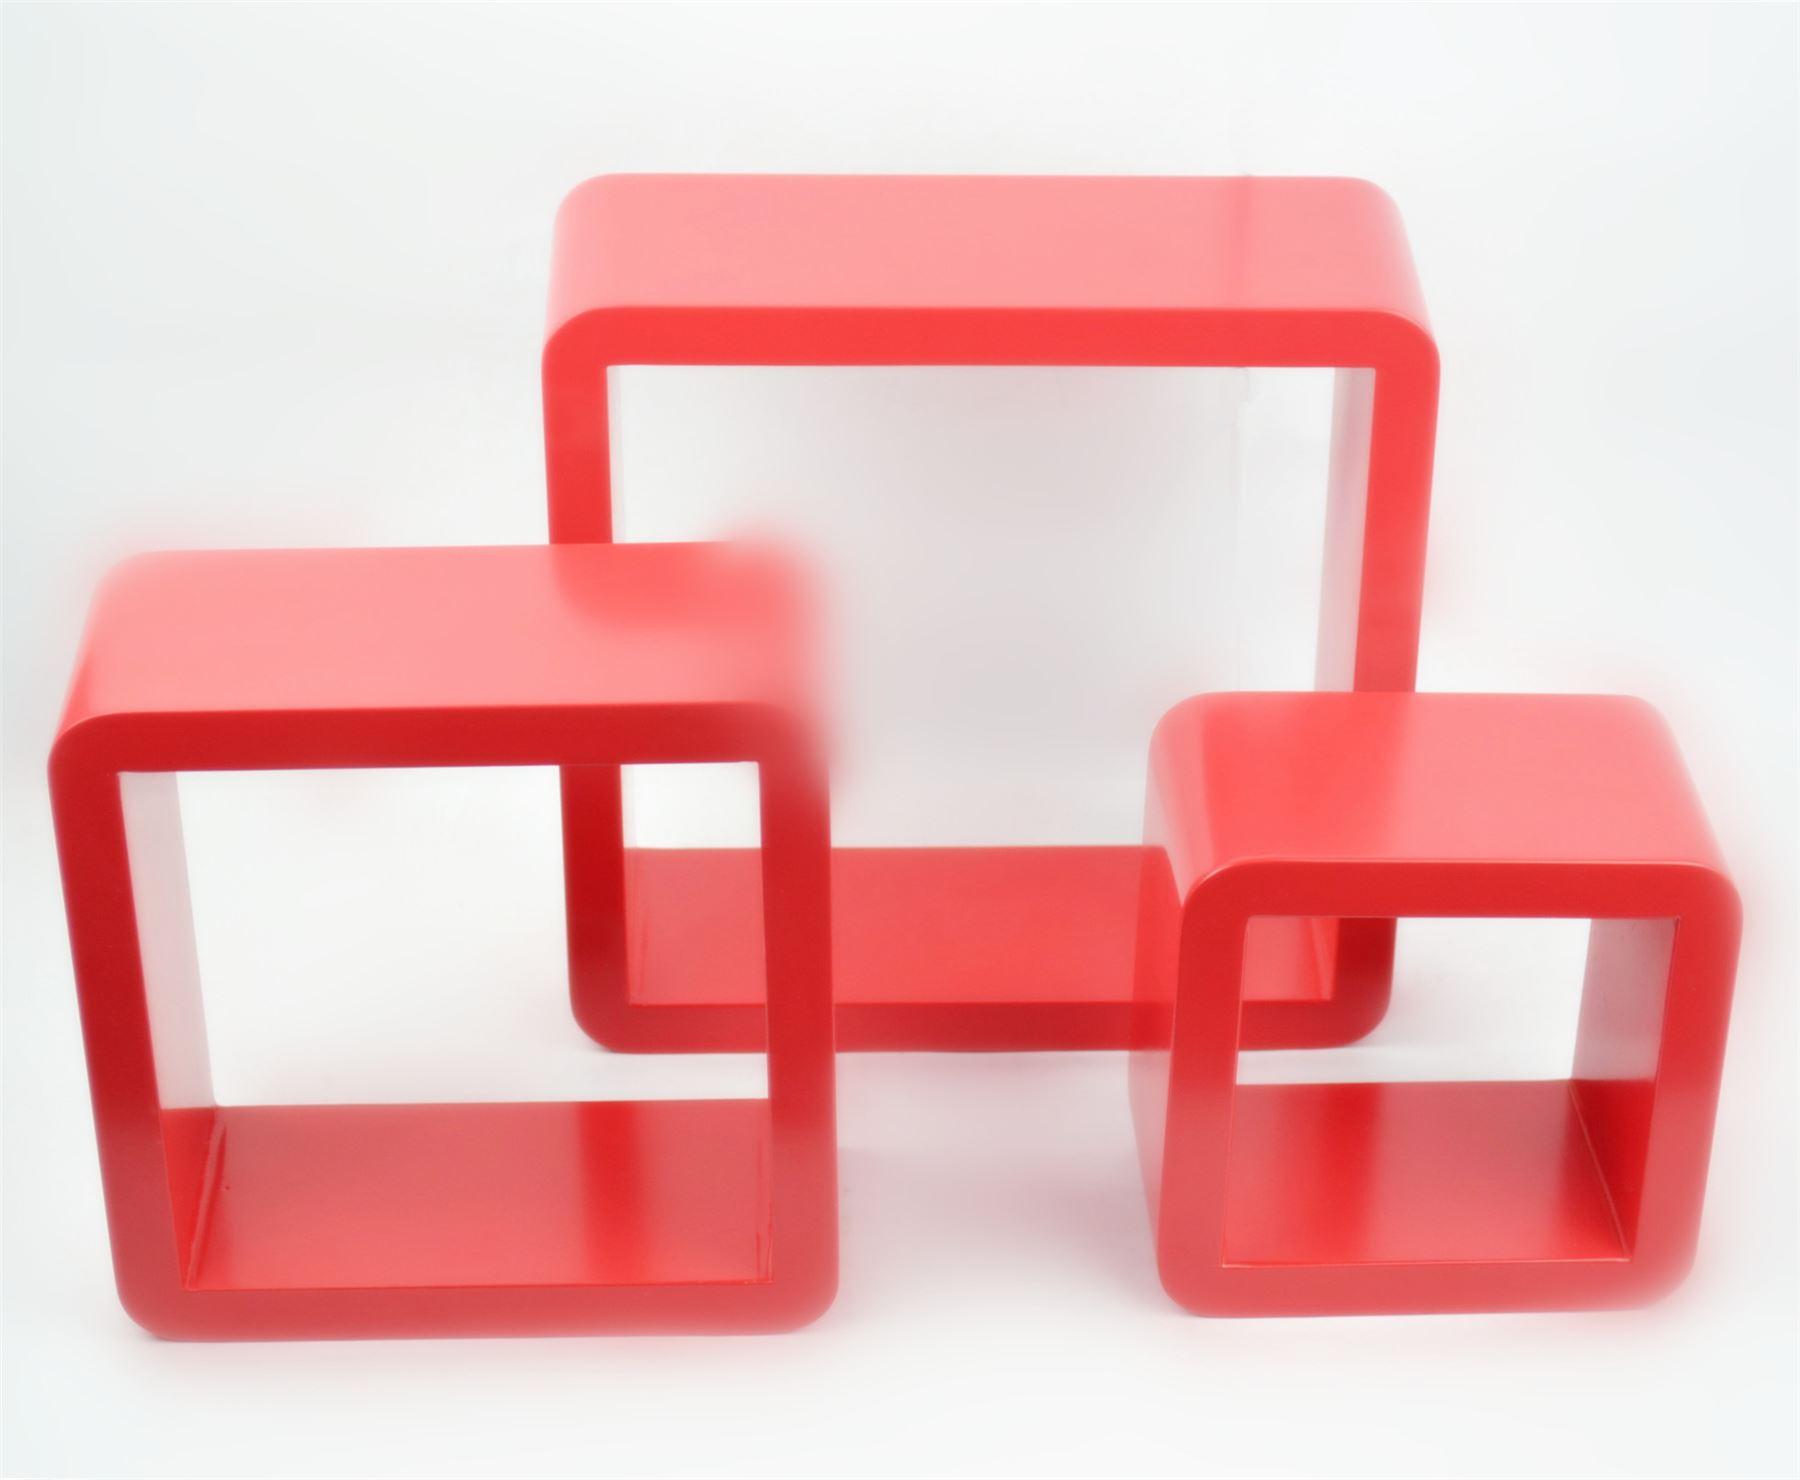 cube wall shelves mdf set of 3 pcs of shelf round corner flo